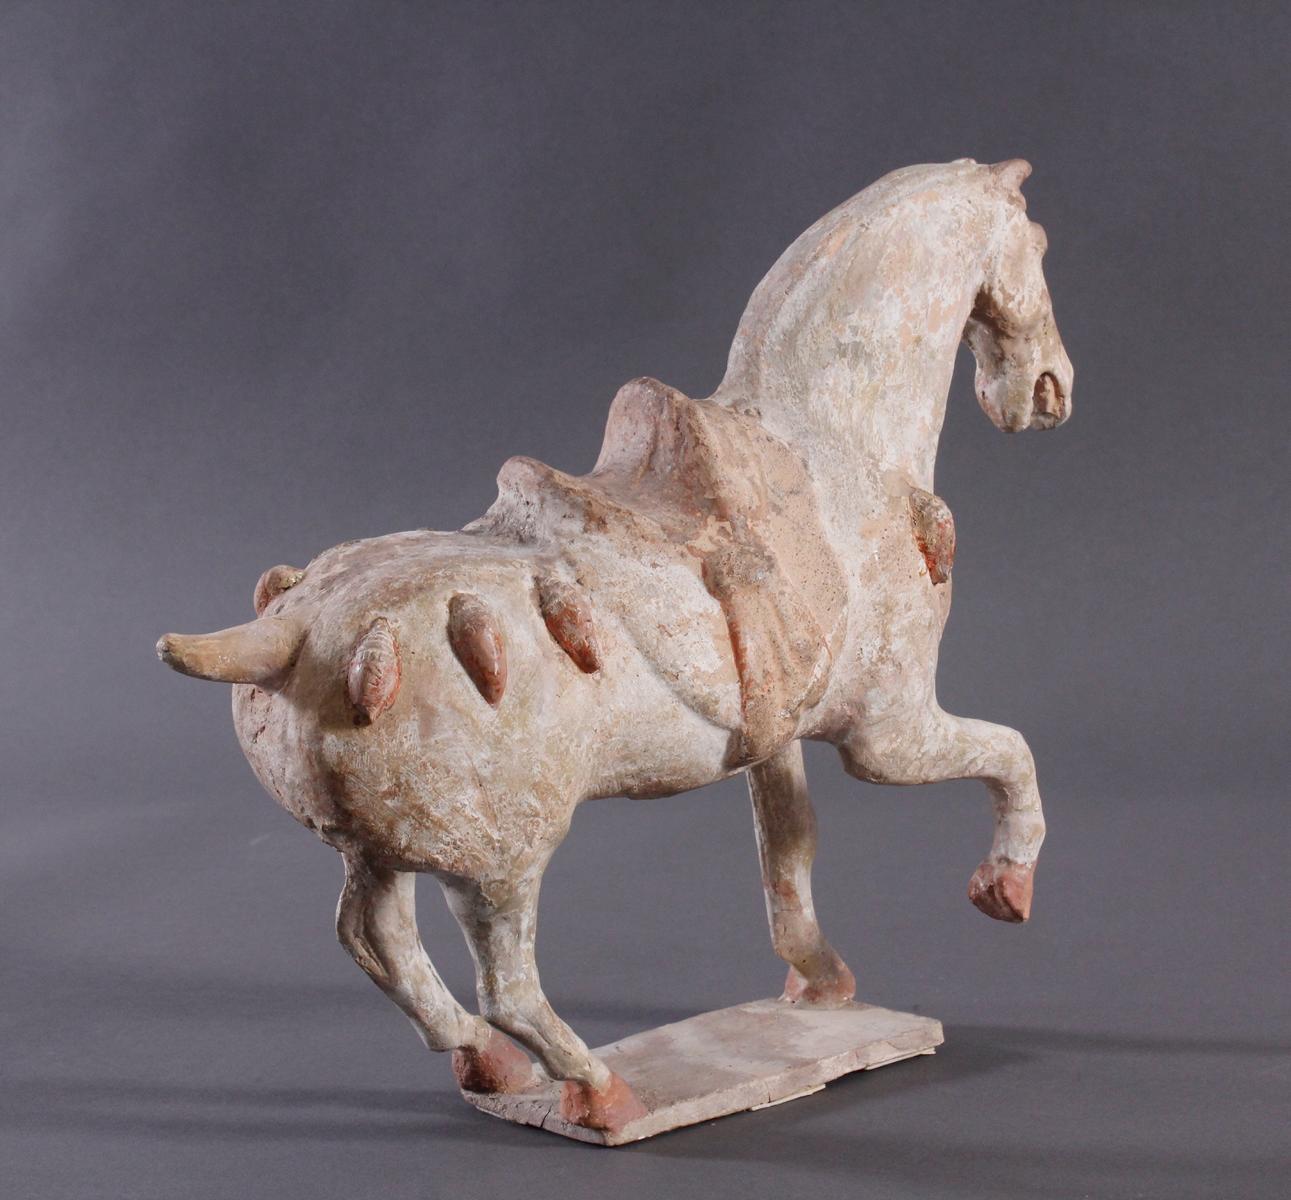 China Tang-Dynastie, Pferd aus gebranntem Ton-4